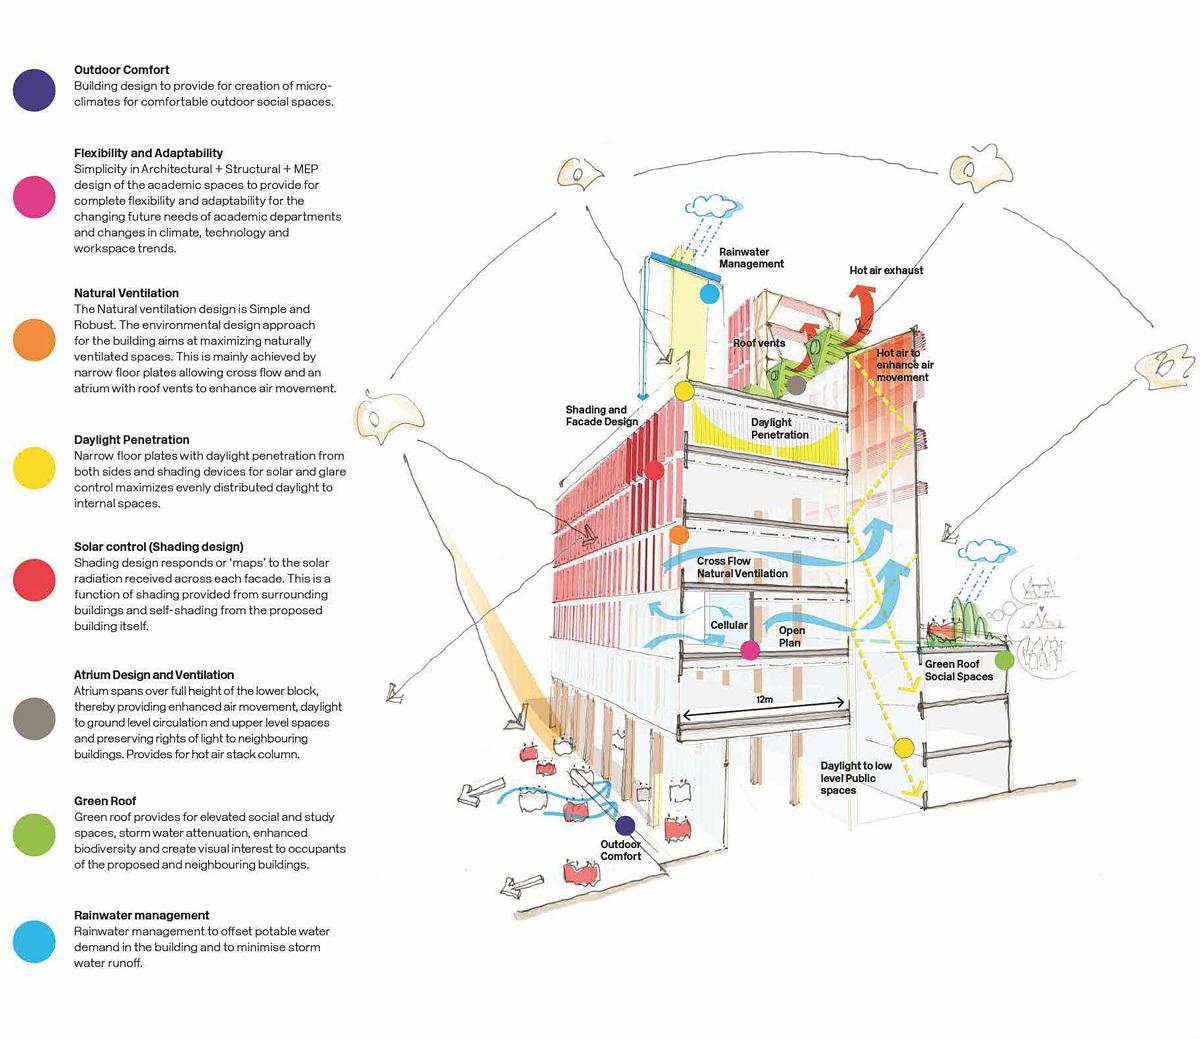 M&E strategy diagram. Image courtesy of RIBA.